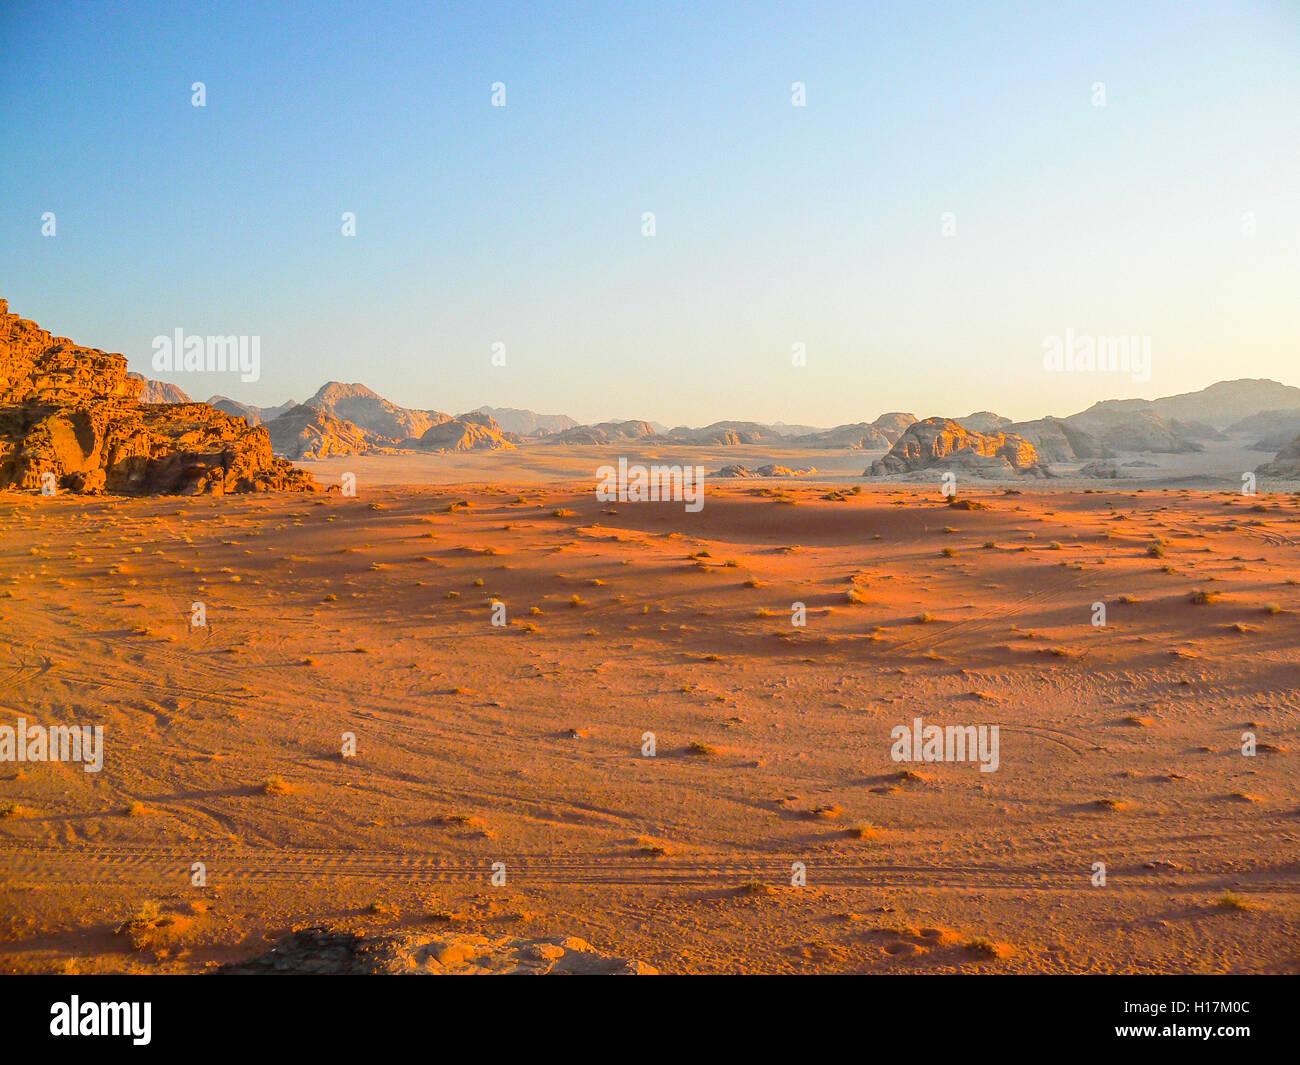 Sunset in the Desert of Wadi Rum, Jordan - Stock Image